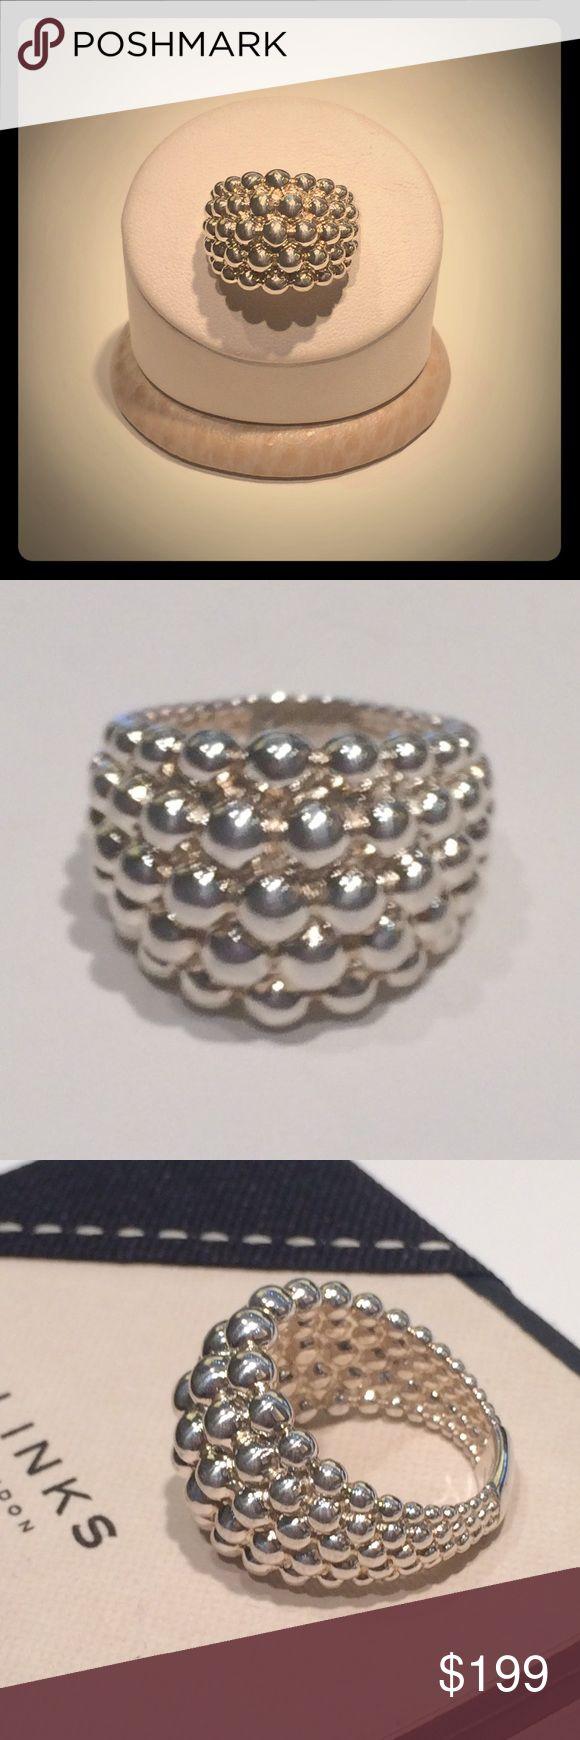 Venture mens black leather bracelet men bracelets links of london - Nwt Links Of London Silver Effervescence Ring Boutique